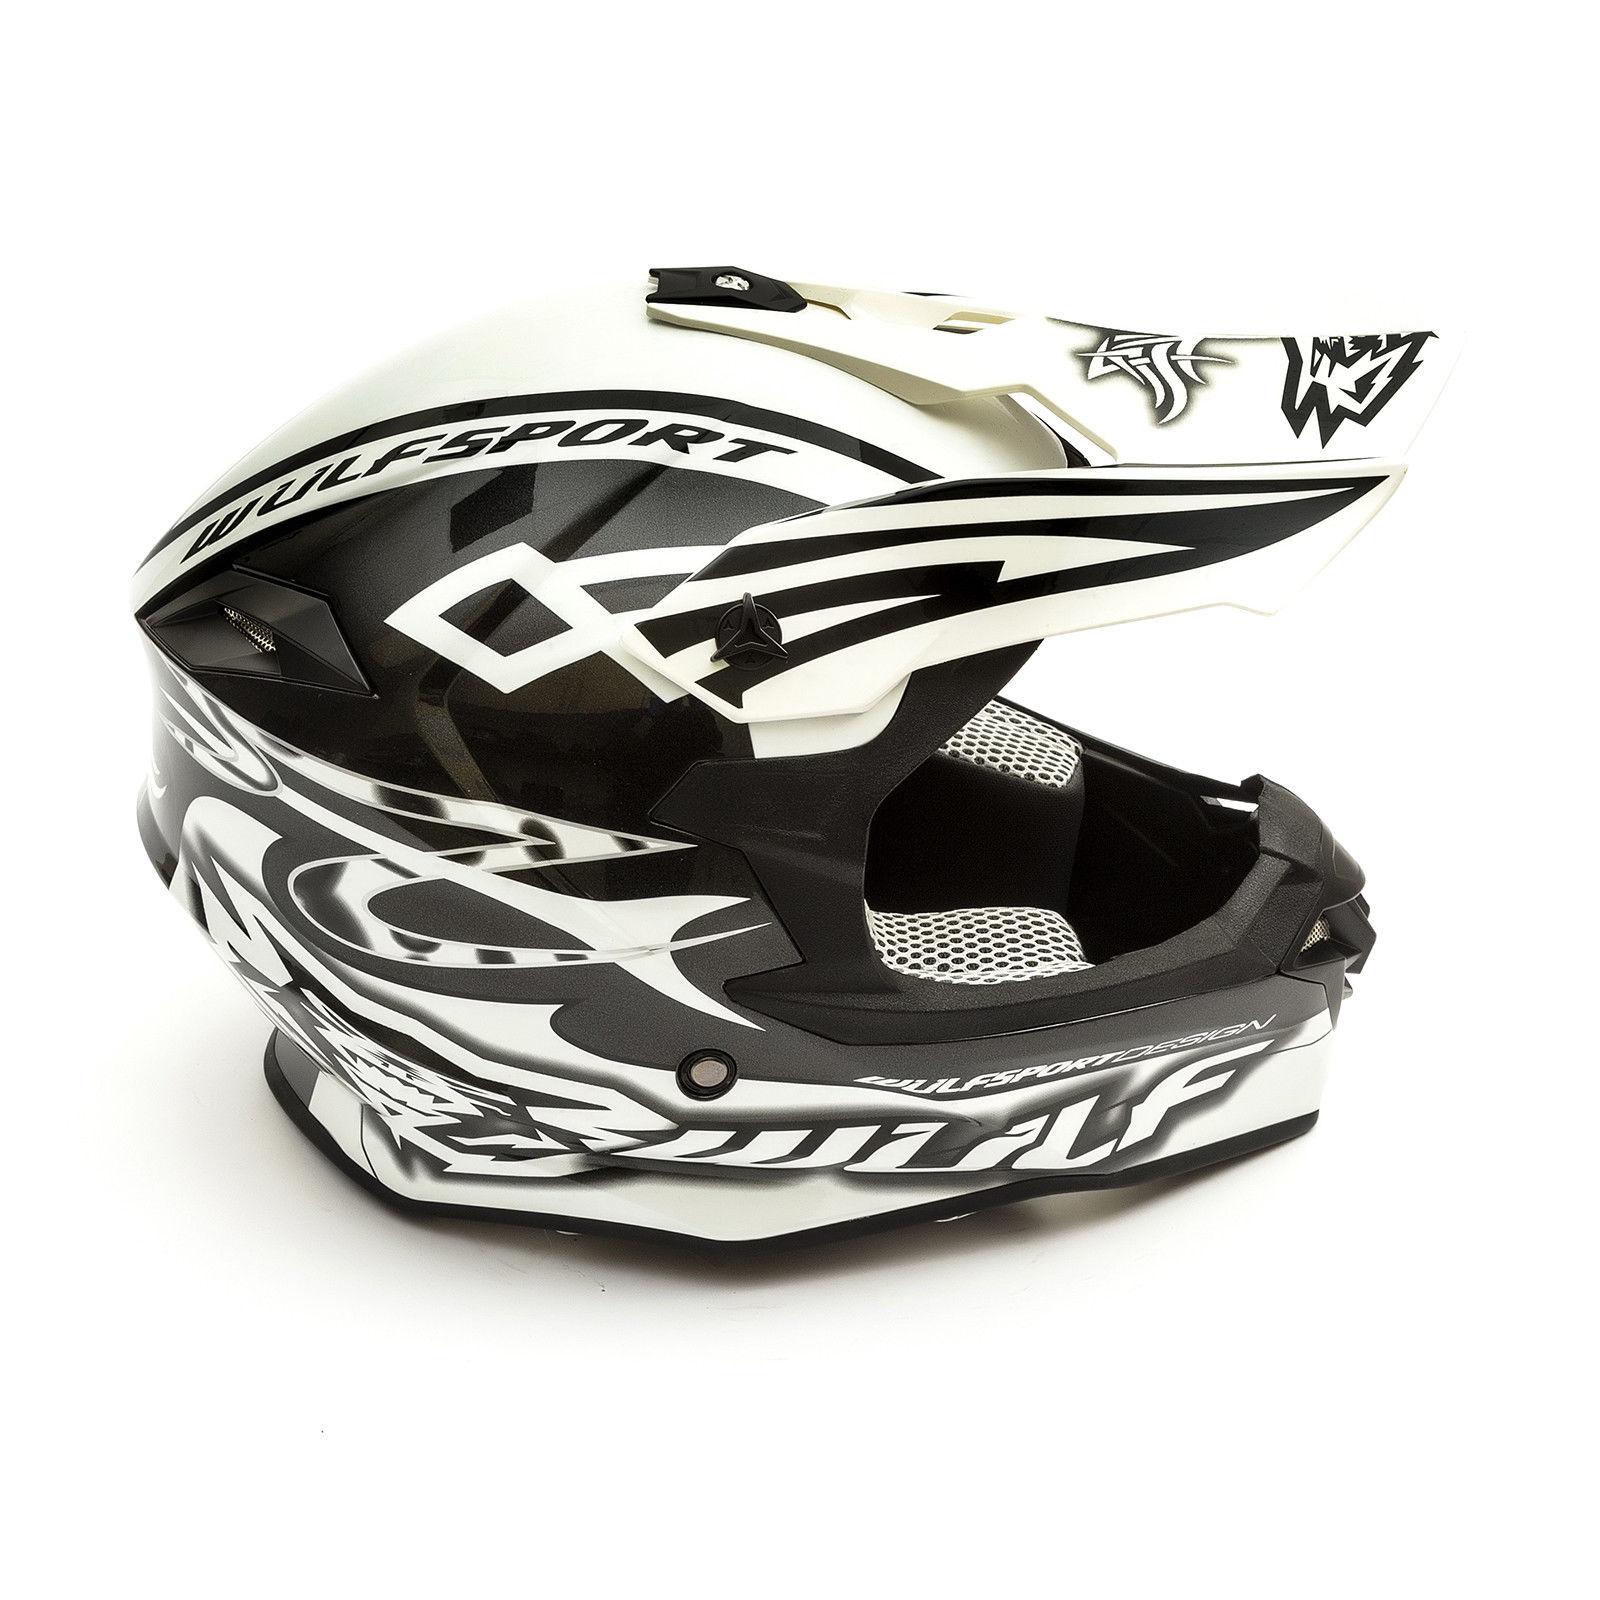 Wulfsport-Adult-Sceptre-Helmets-Motocross-Pitbike-Motorbike-Off-Road-Racing-ATV thumbnail 56